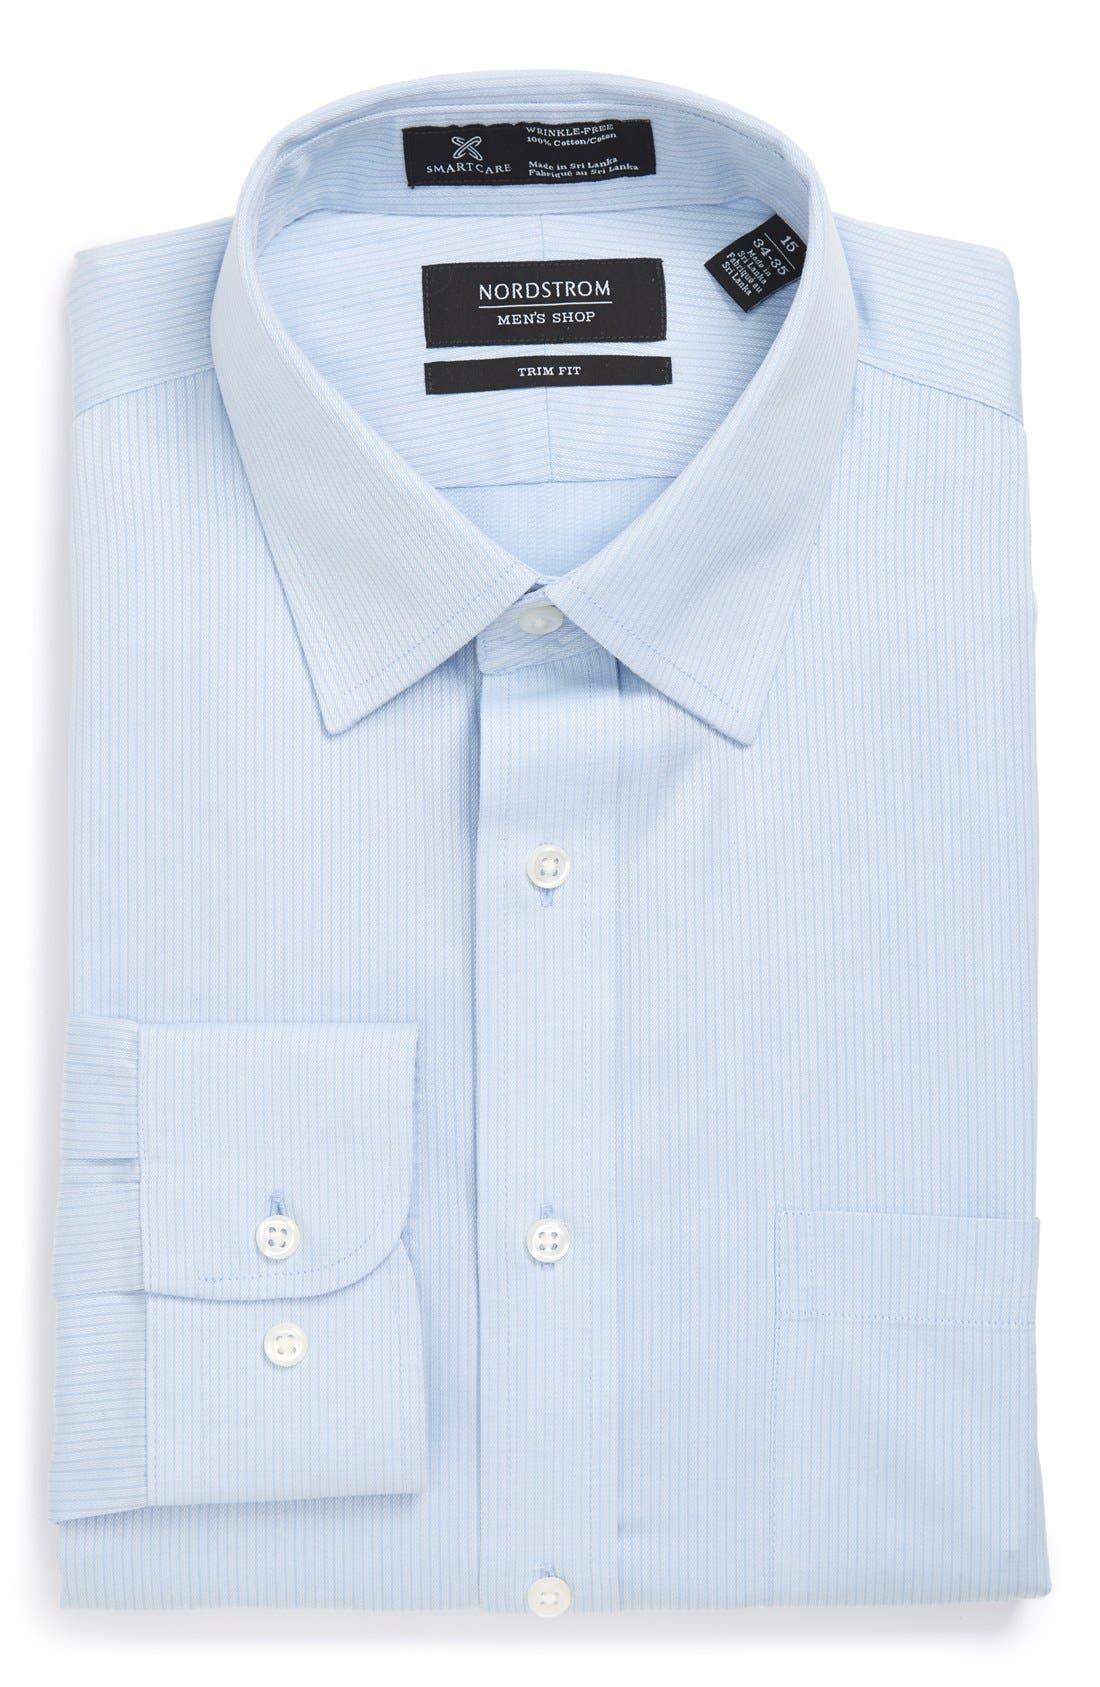 NORDSTROM MENS SHOP Smartcare<sup>™</sup> Trim Fit Dress Shirt